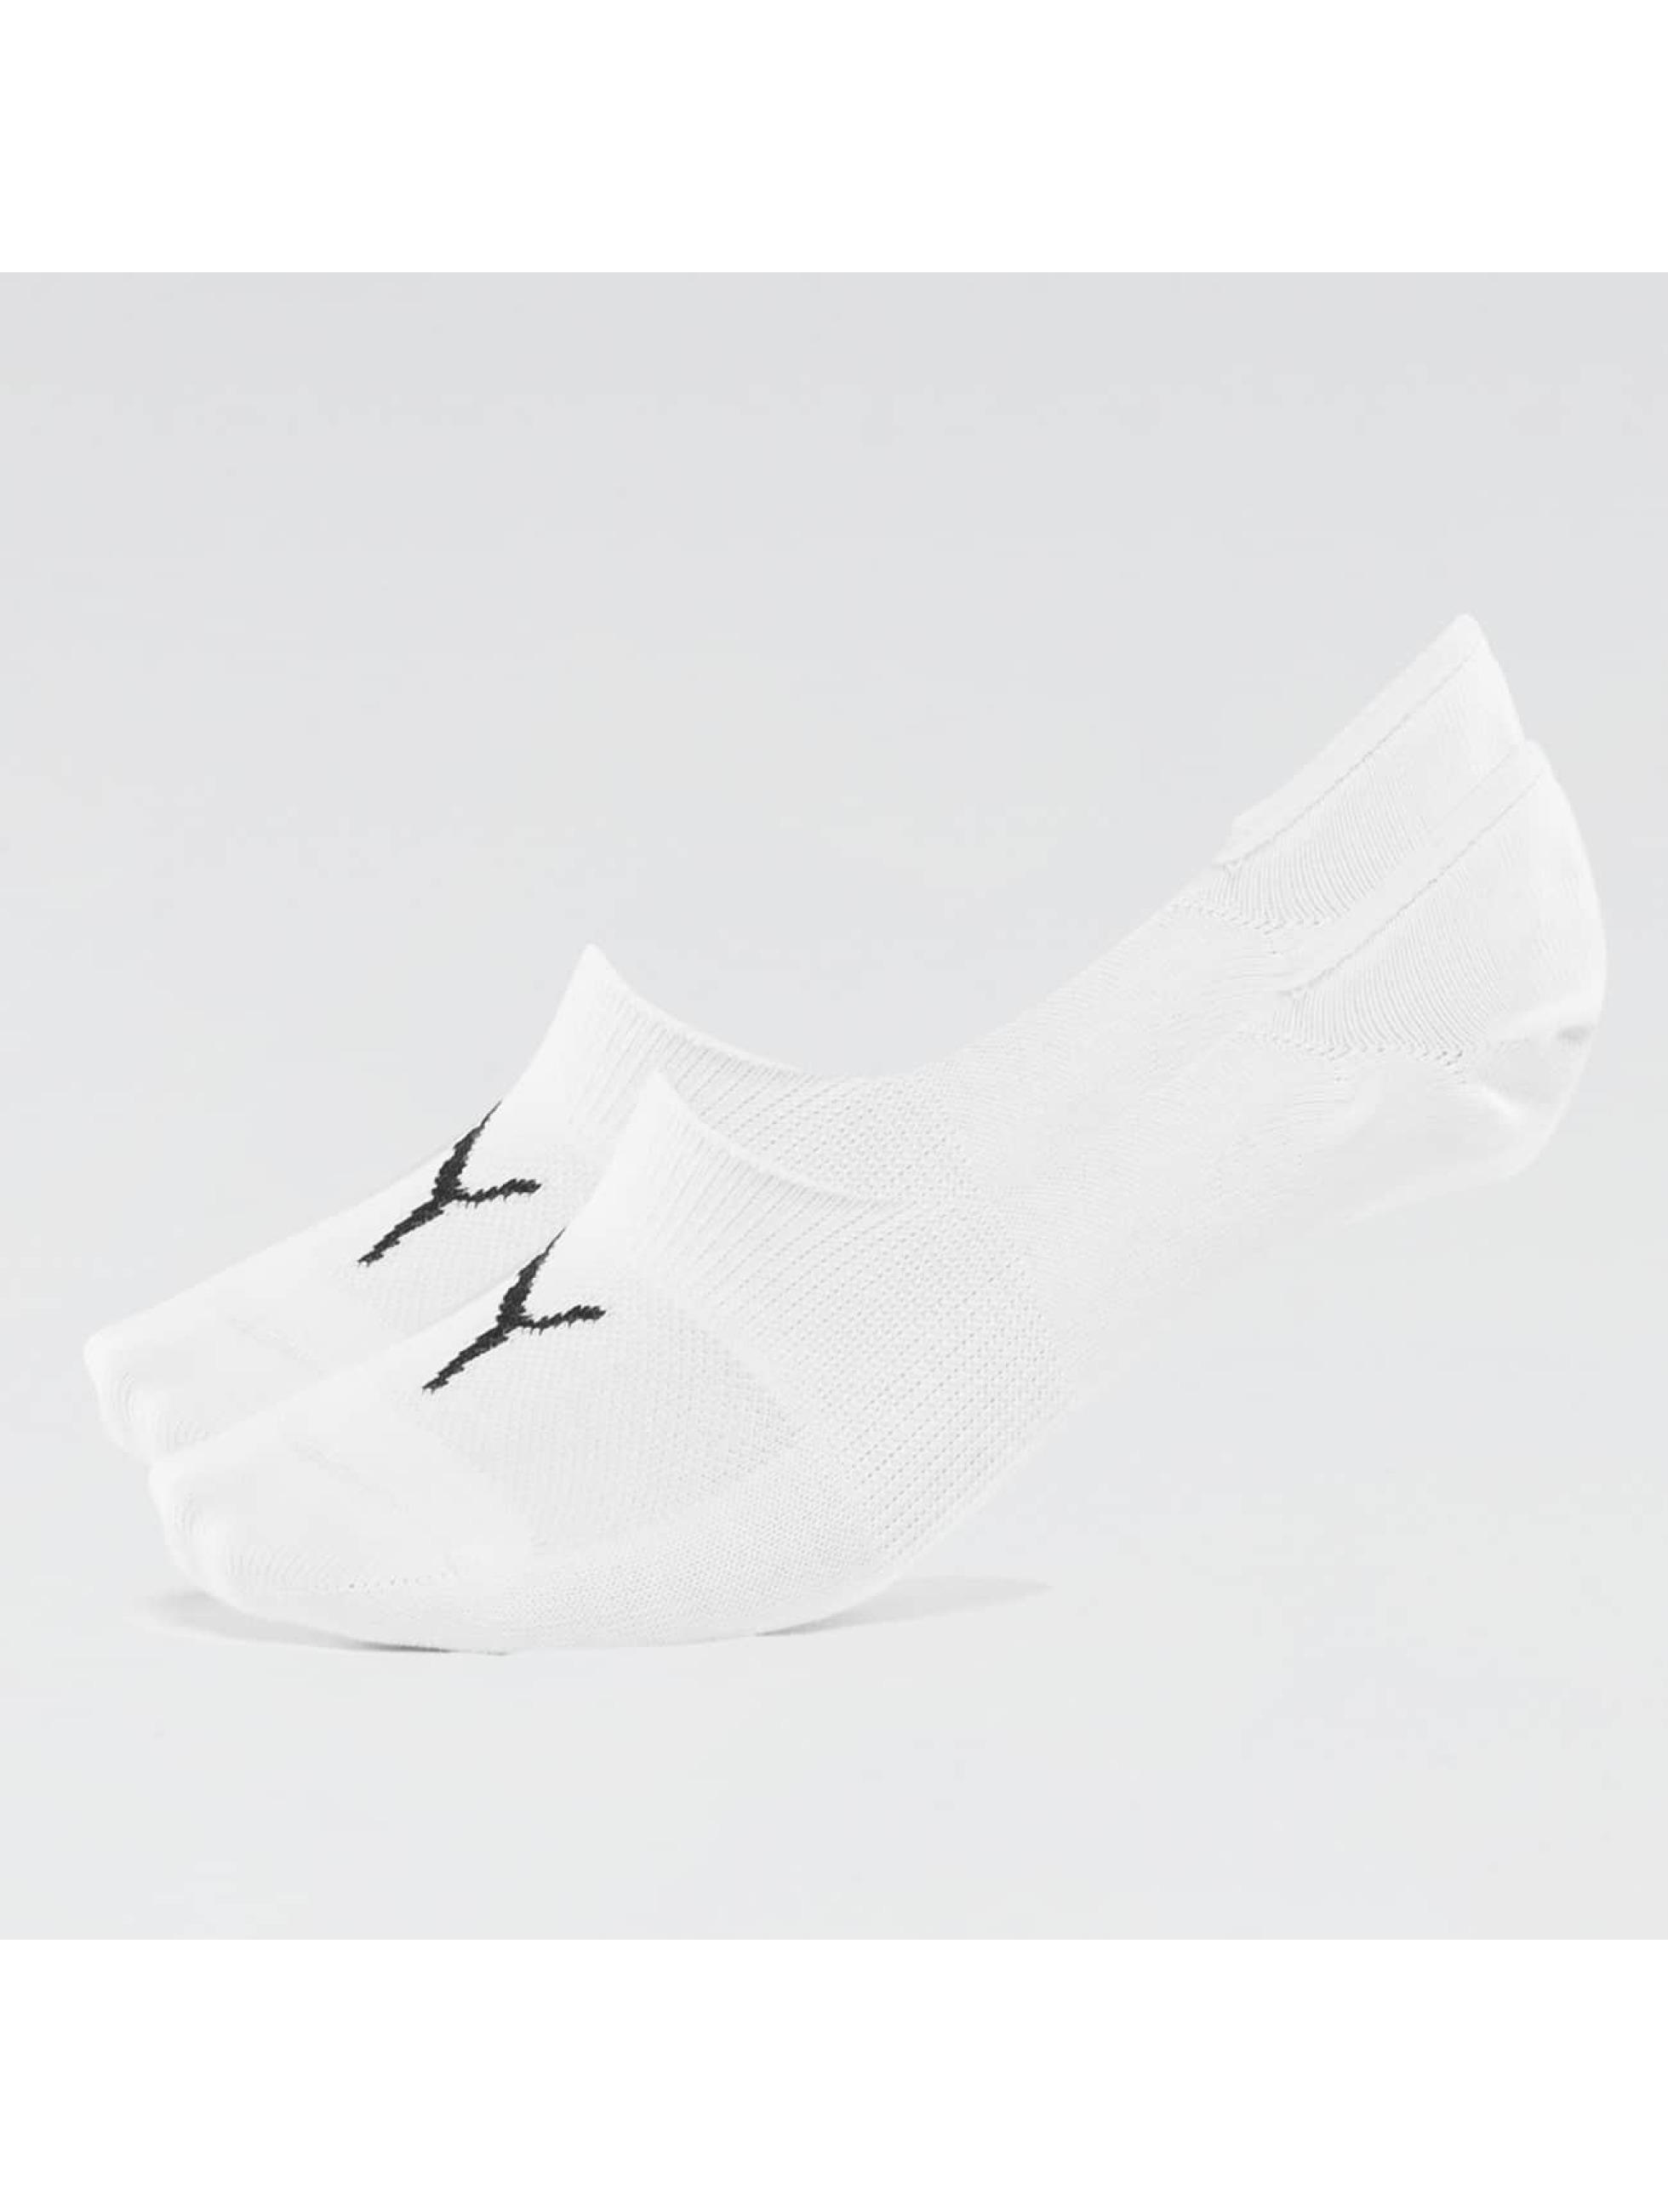 Puma Männer,Frauen Socken 2-Pack Footies in weiß